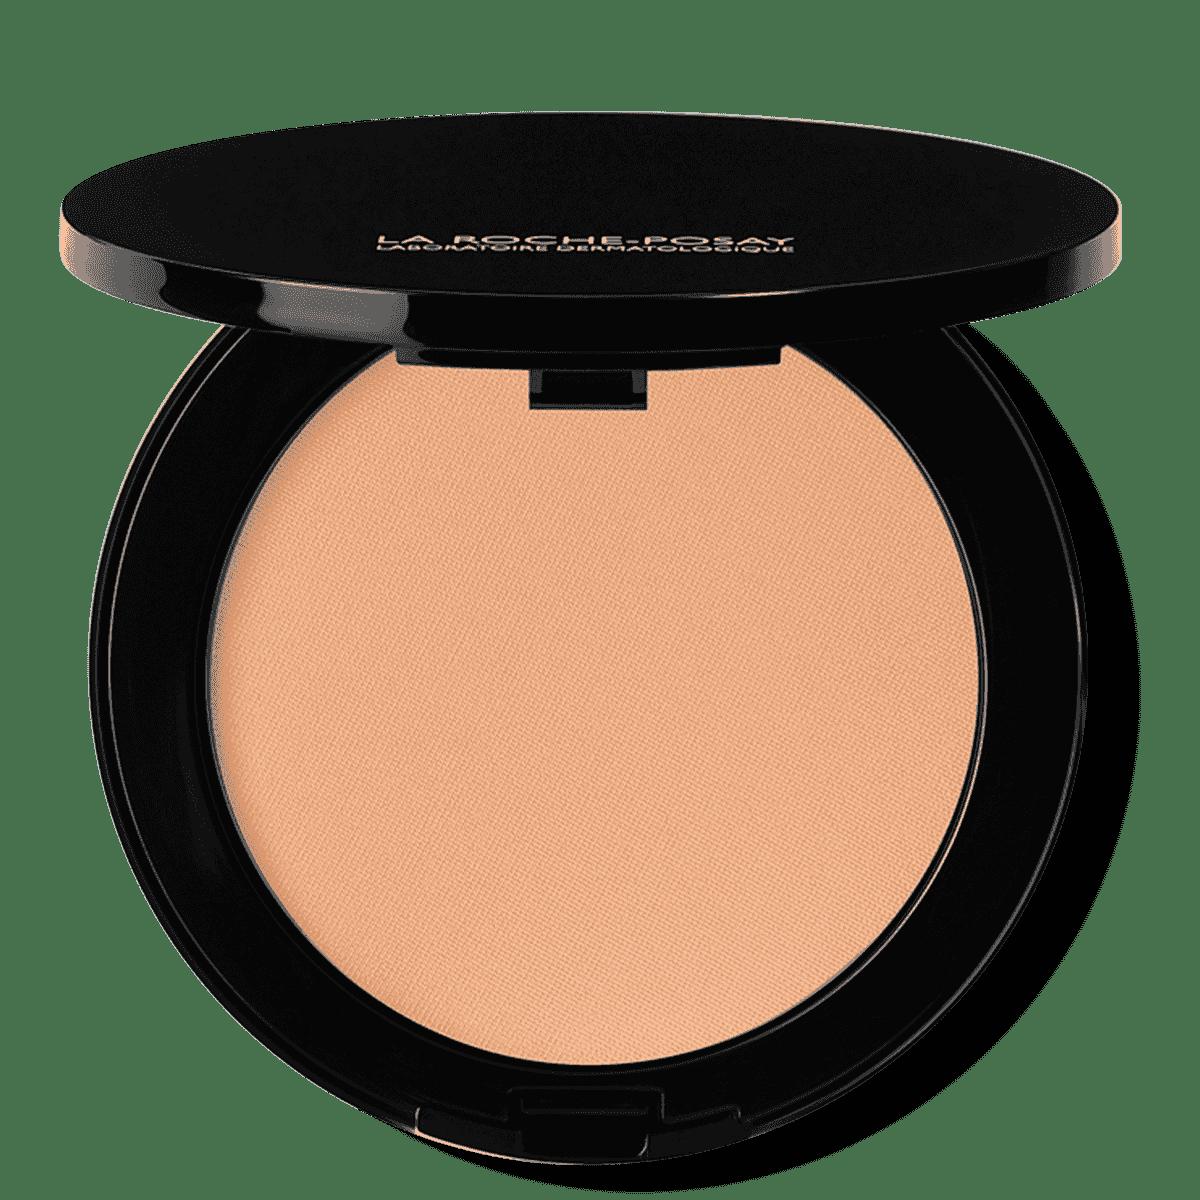 La Roche Posay Sensitiv Toleriane Sminke COMPACT POWDER 13 SandBeige